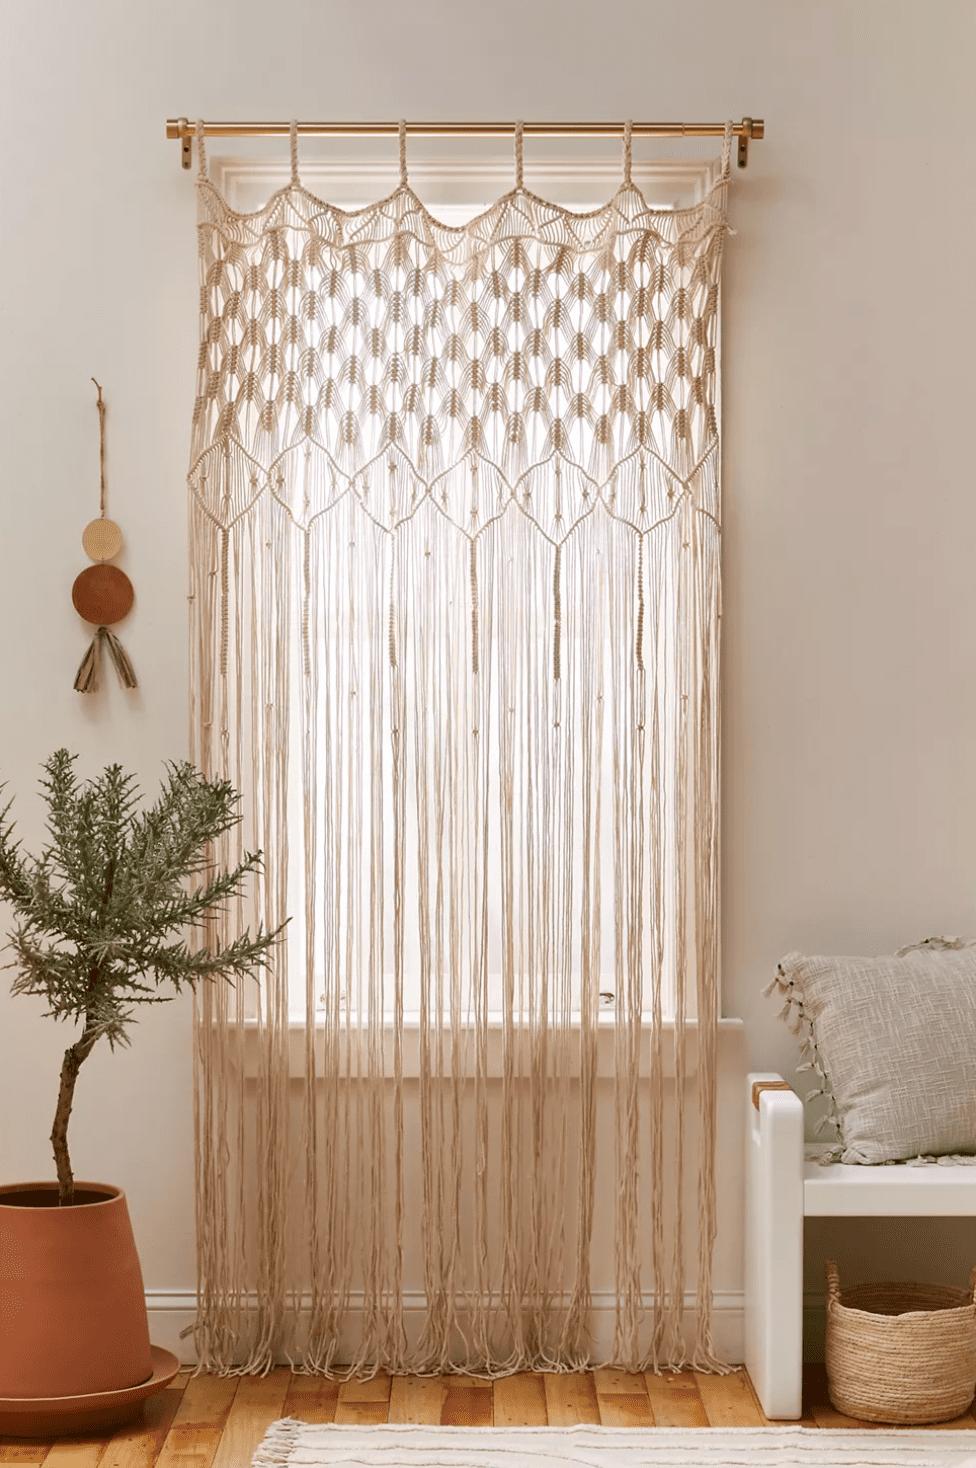 A macrame window panel